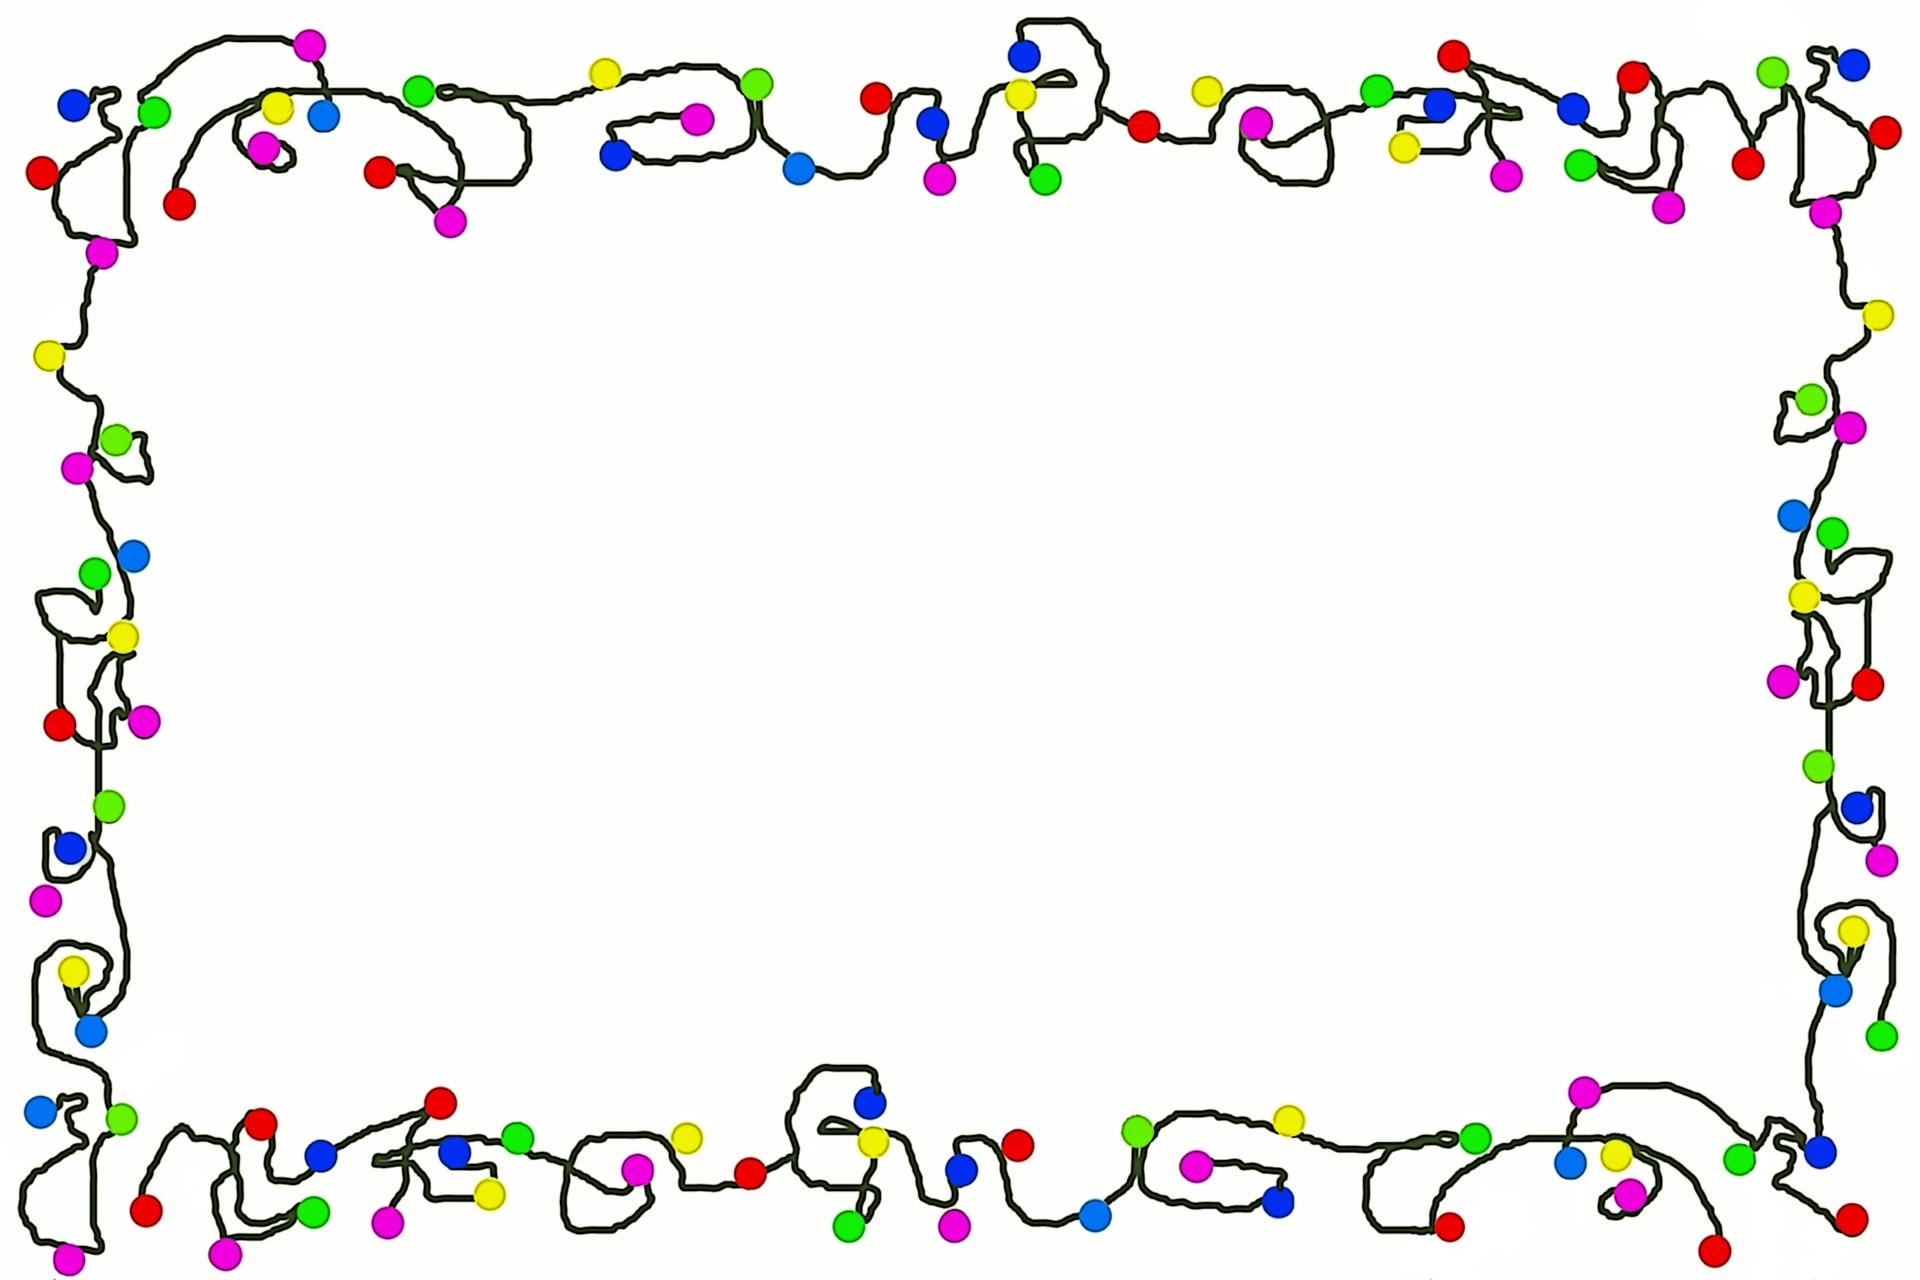 Lights clipart border transparent Free Christmas Cliparts Border, Download Free Clip Art, Free Clip ... transparent